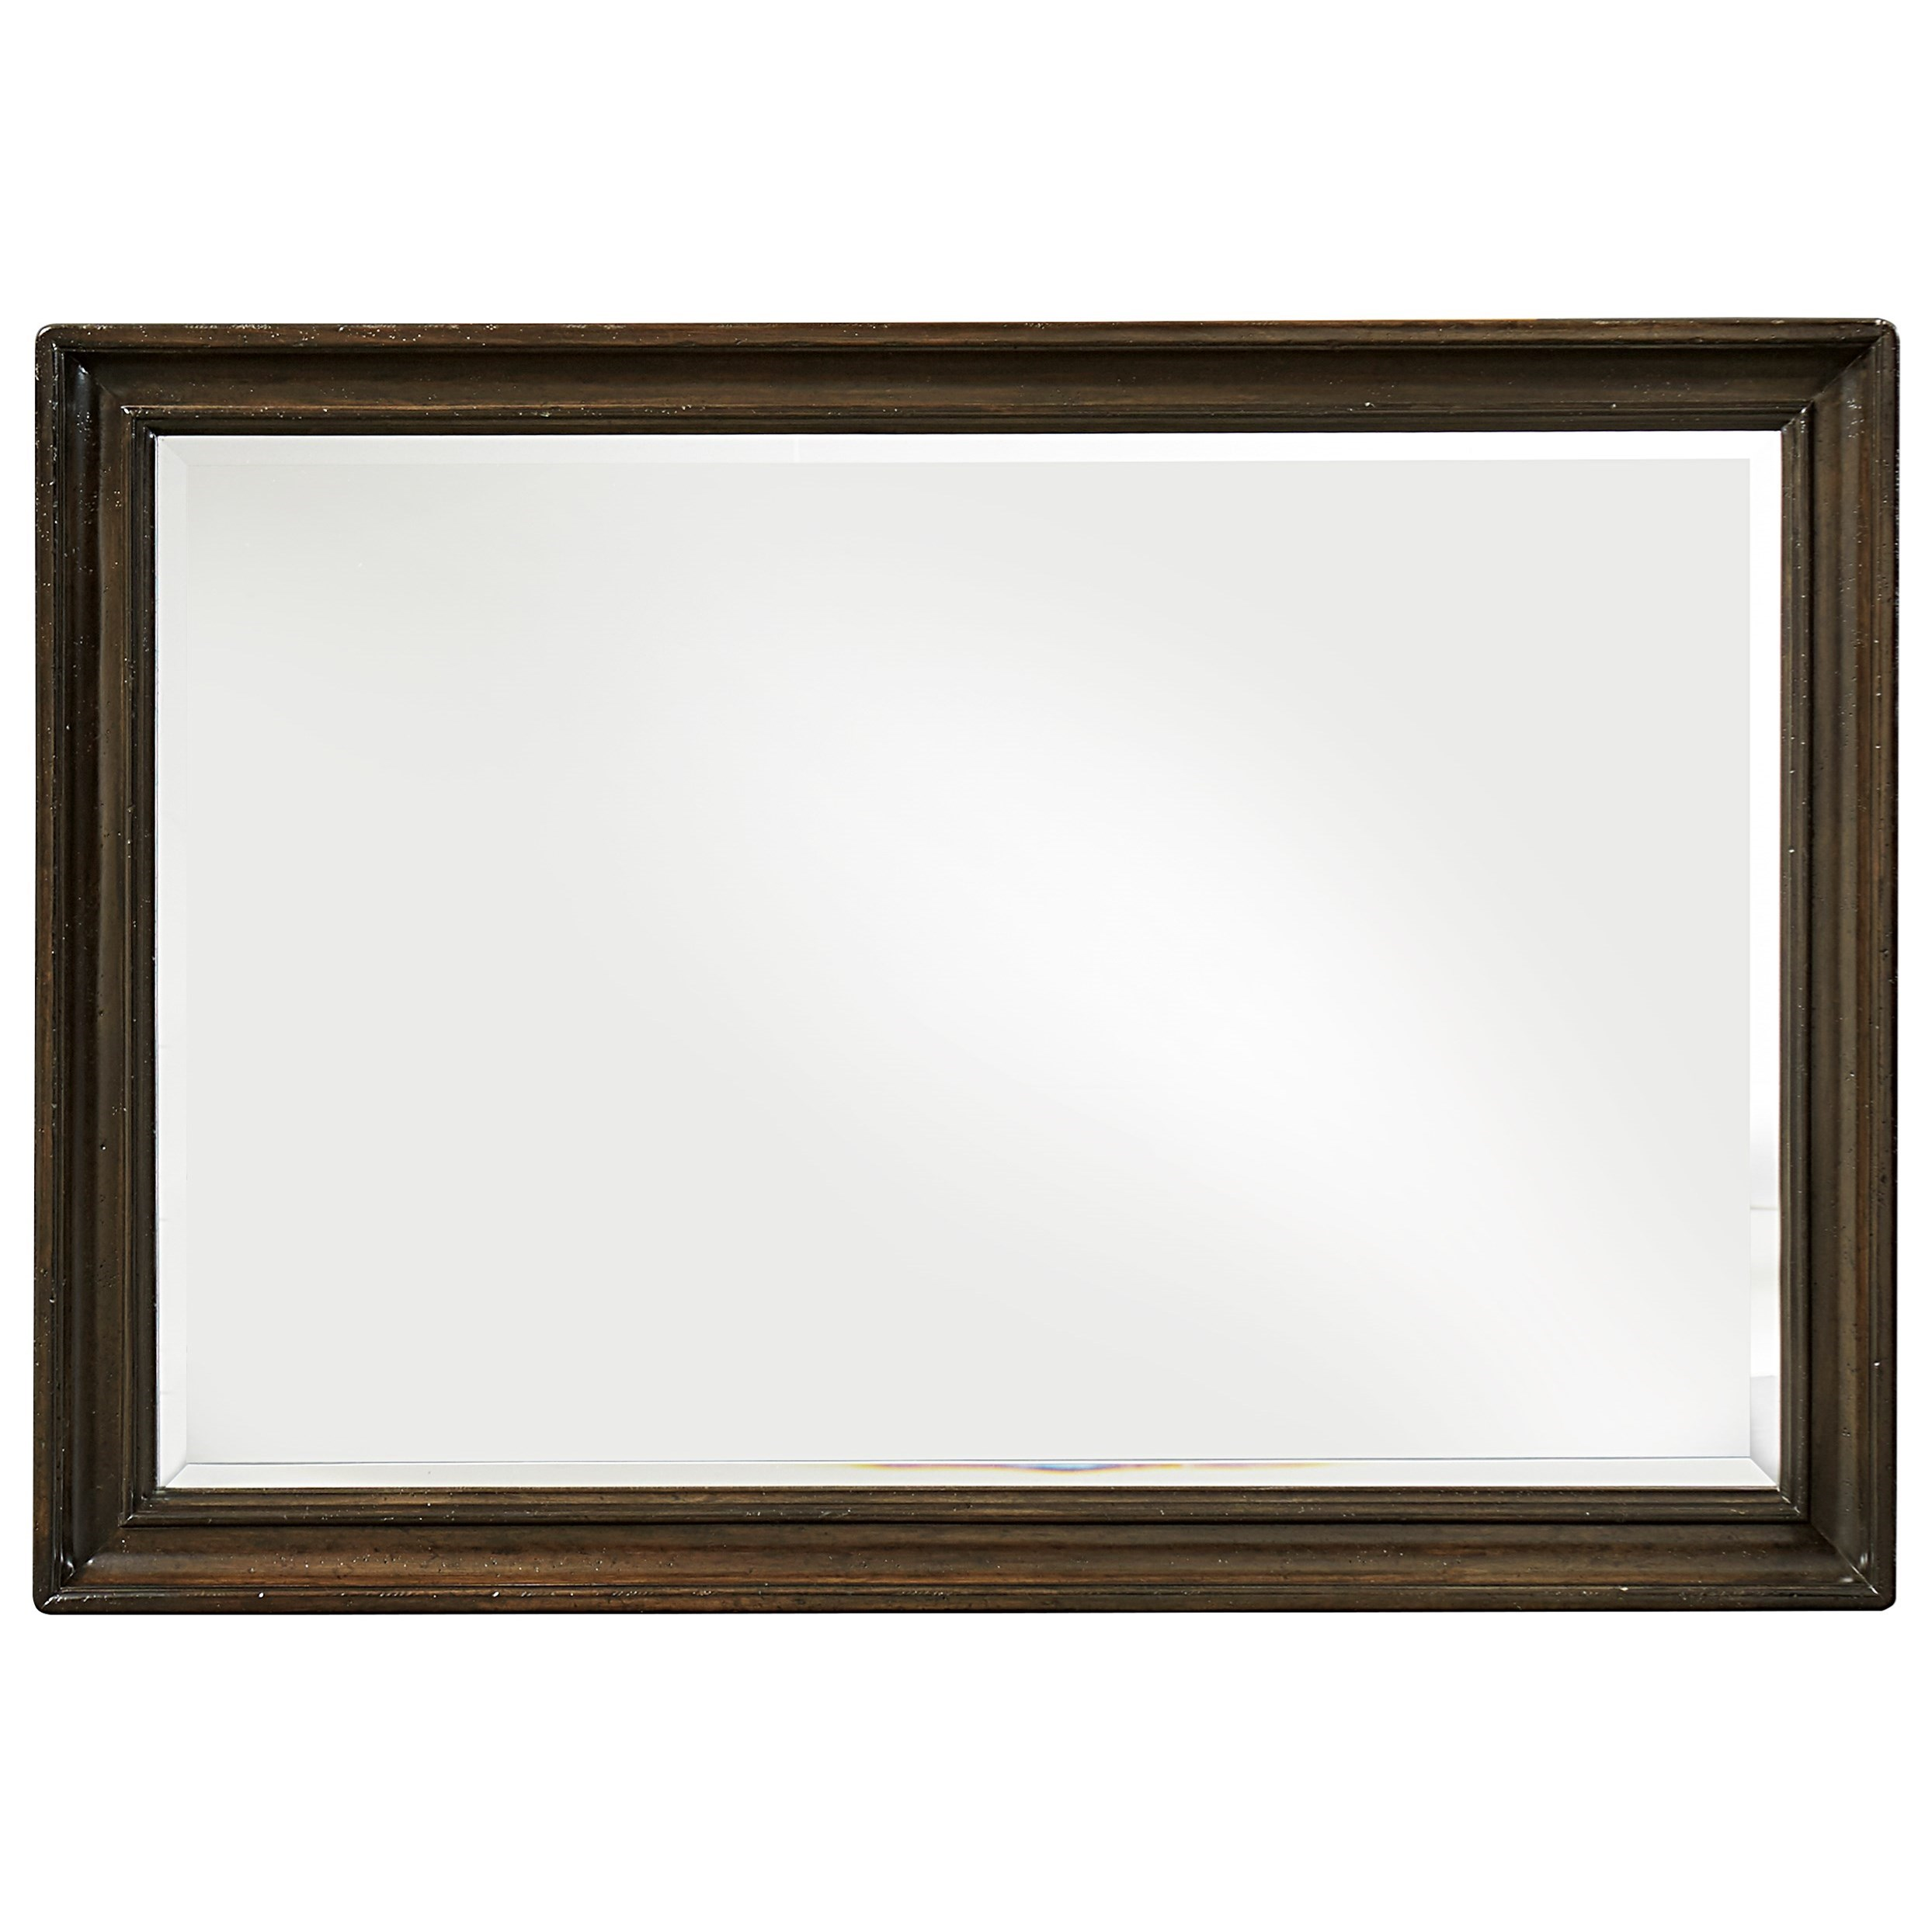 A.R.T. Furniture Inc Continental Rectangular Mirror - Item Number: 237120-2615